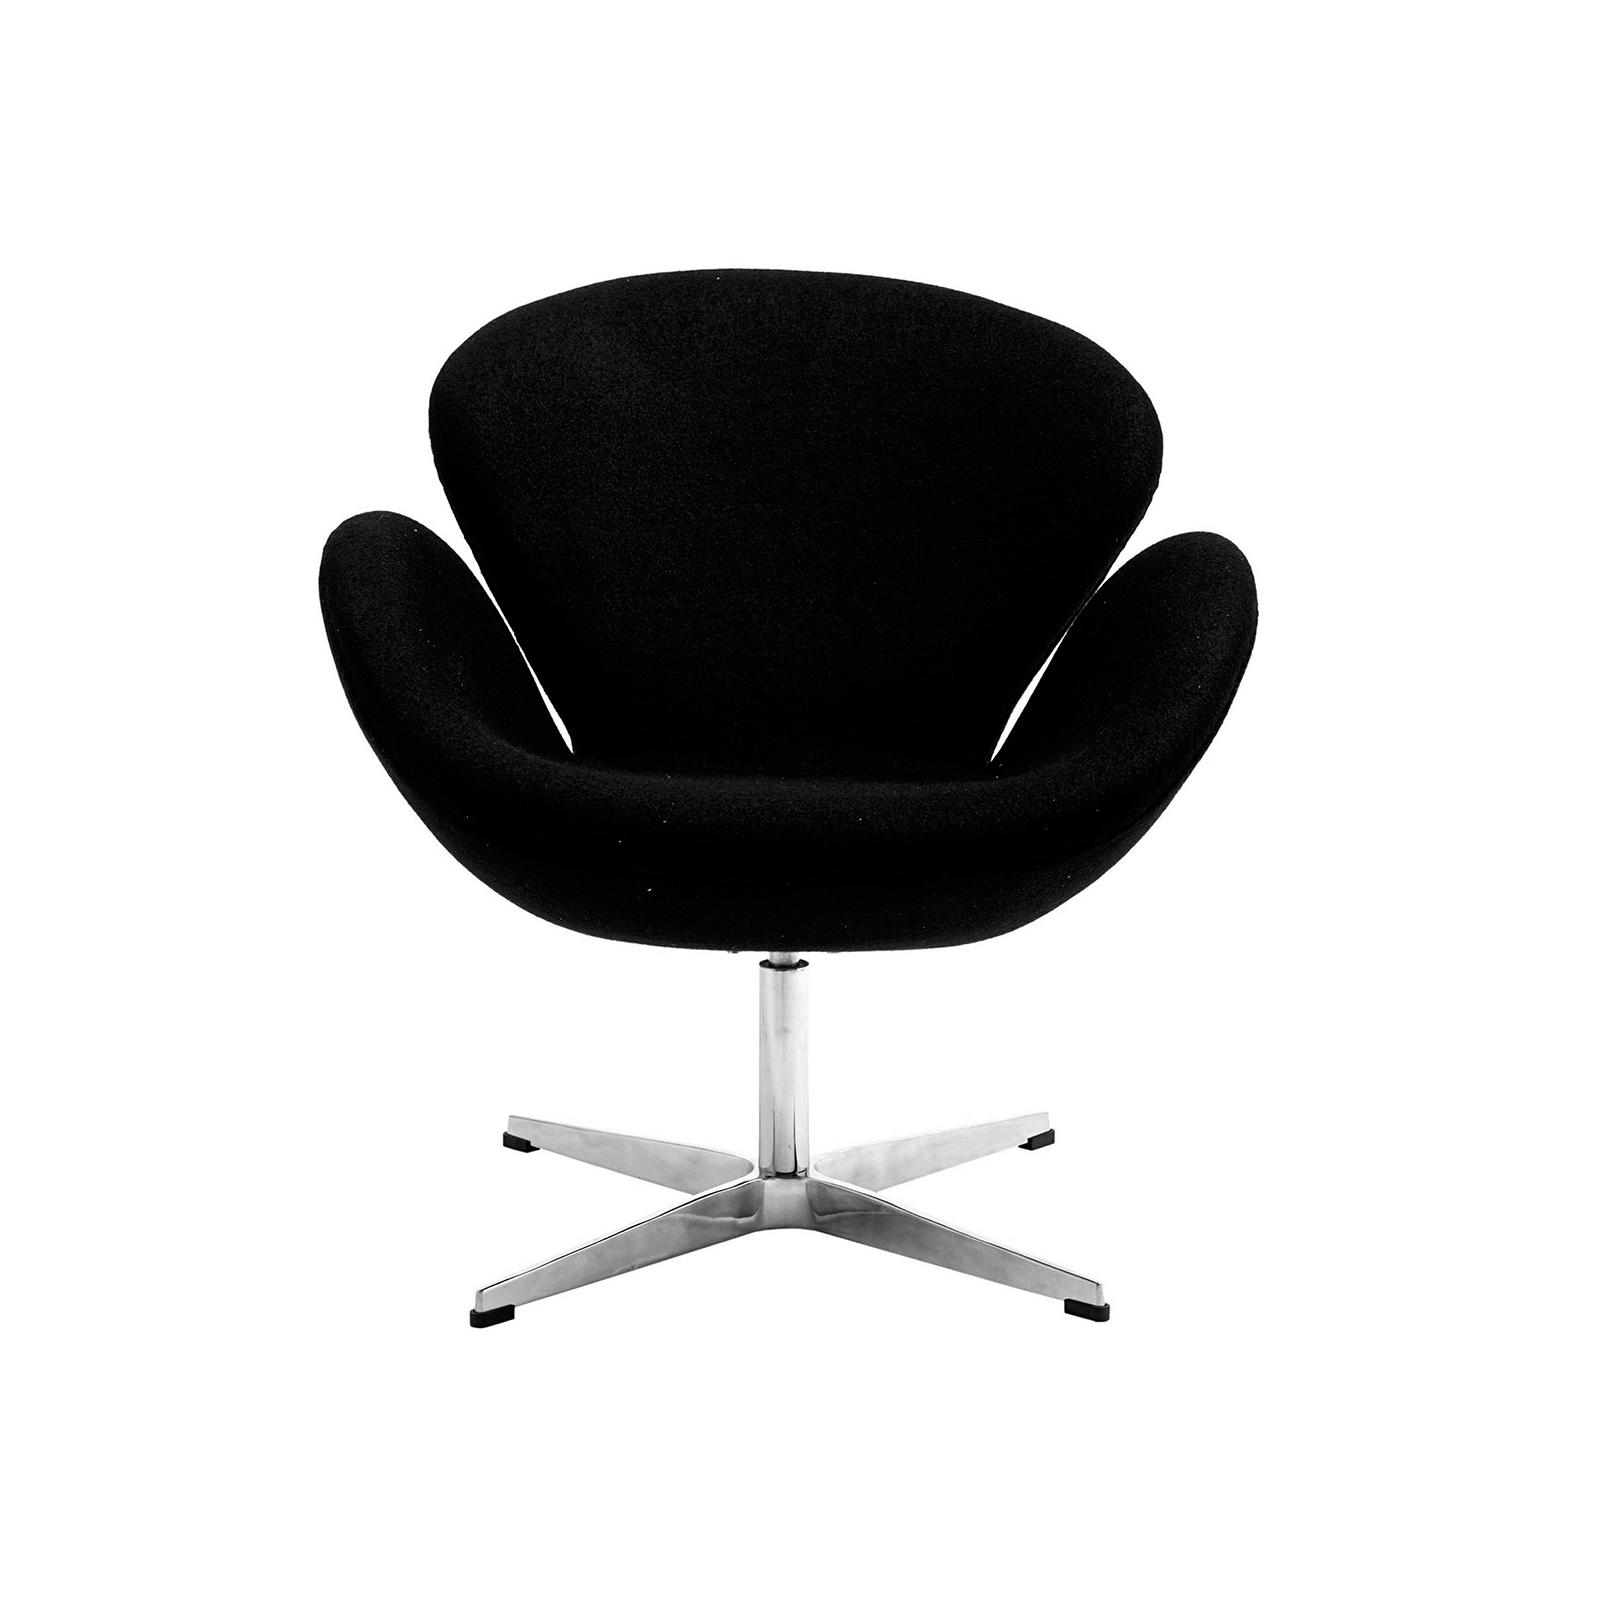 Swan chair jacobsen - Arne Jacobsen Swan Chair